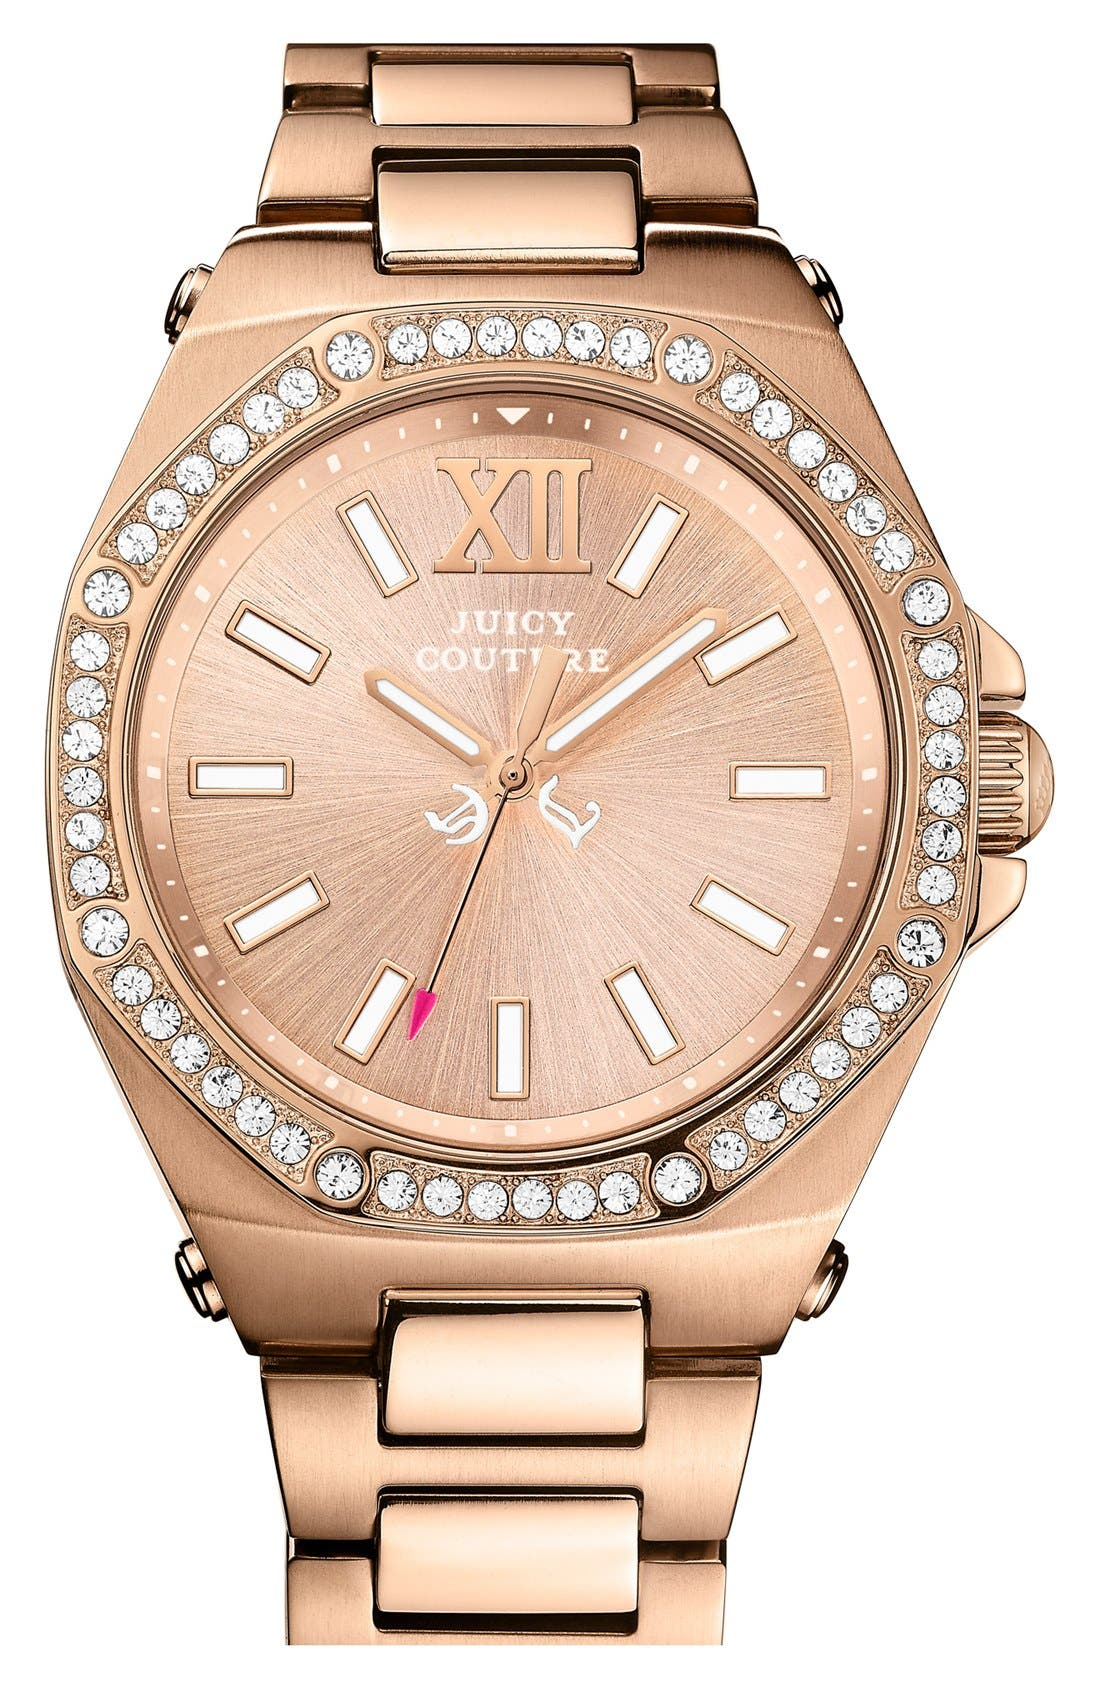 Main Image - Juicy Couture 'Chelsea' Octagonal Bracelet Watch, 42mm